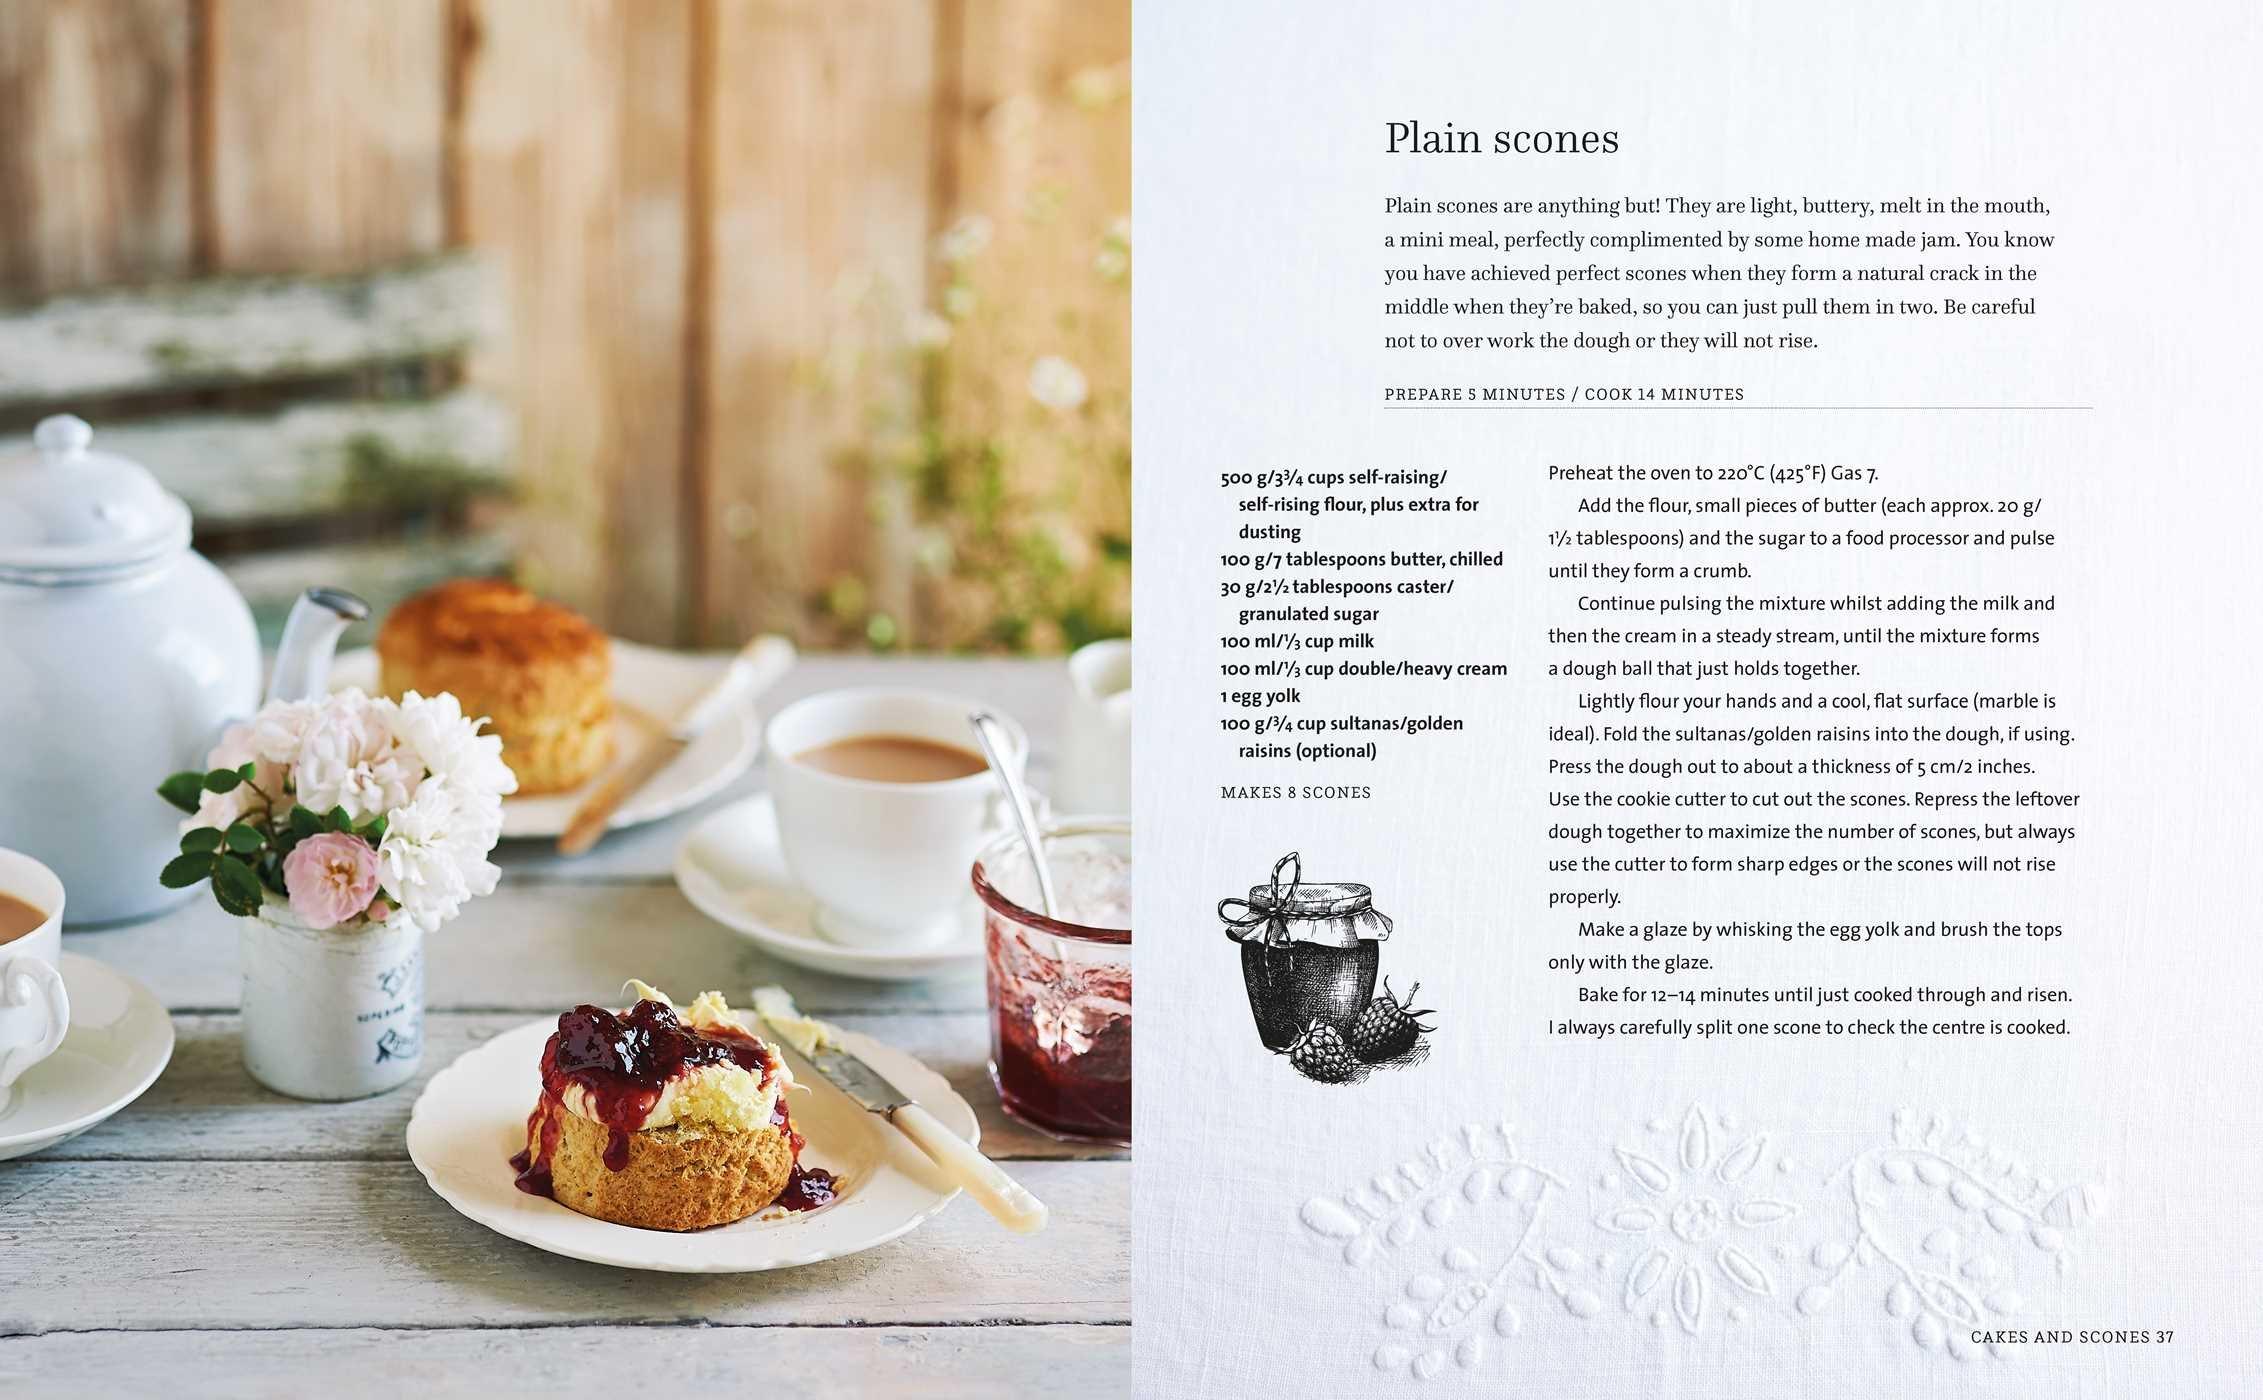 Afternoon Tea at Bramble Cafe: Amazon.co.uk: Mat Follas ...